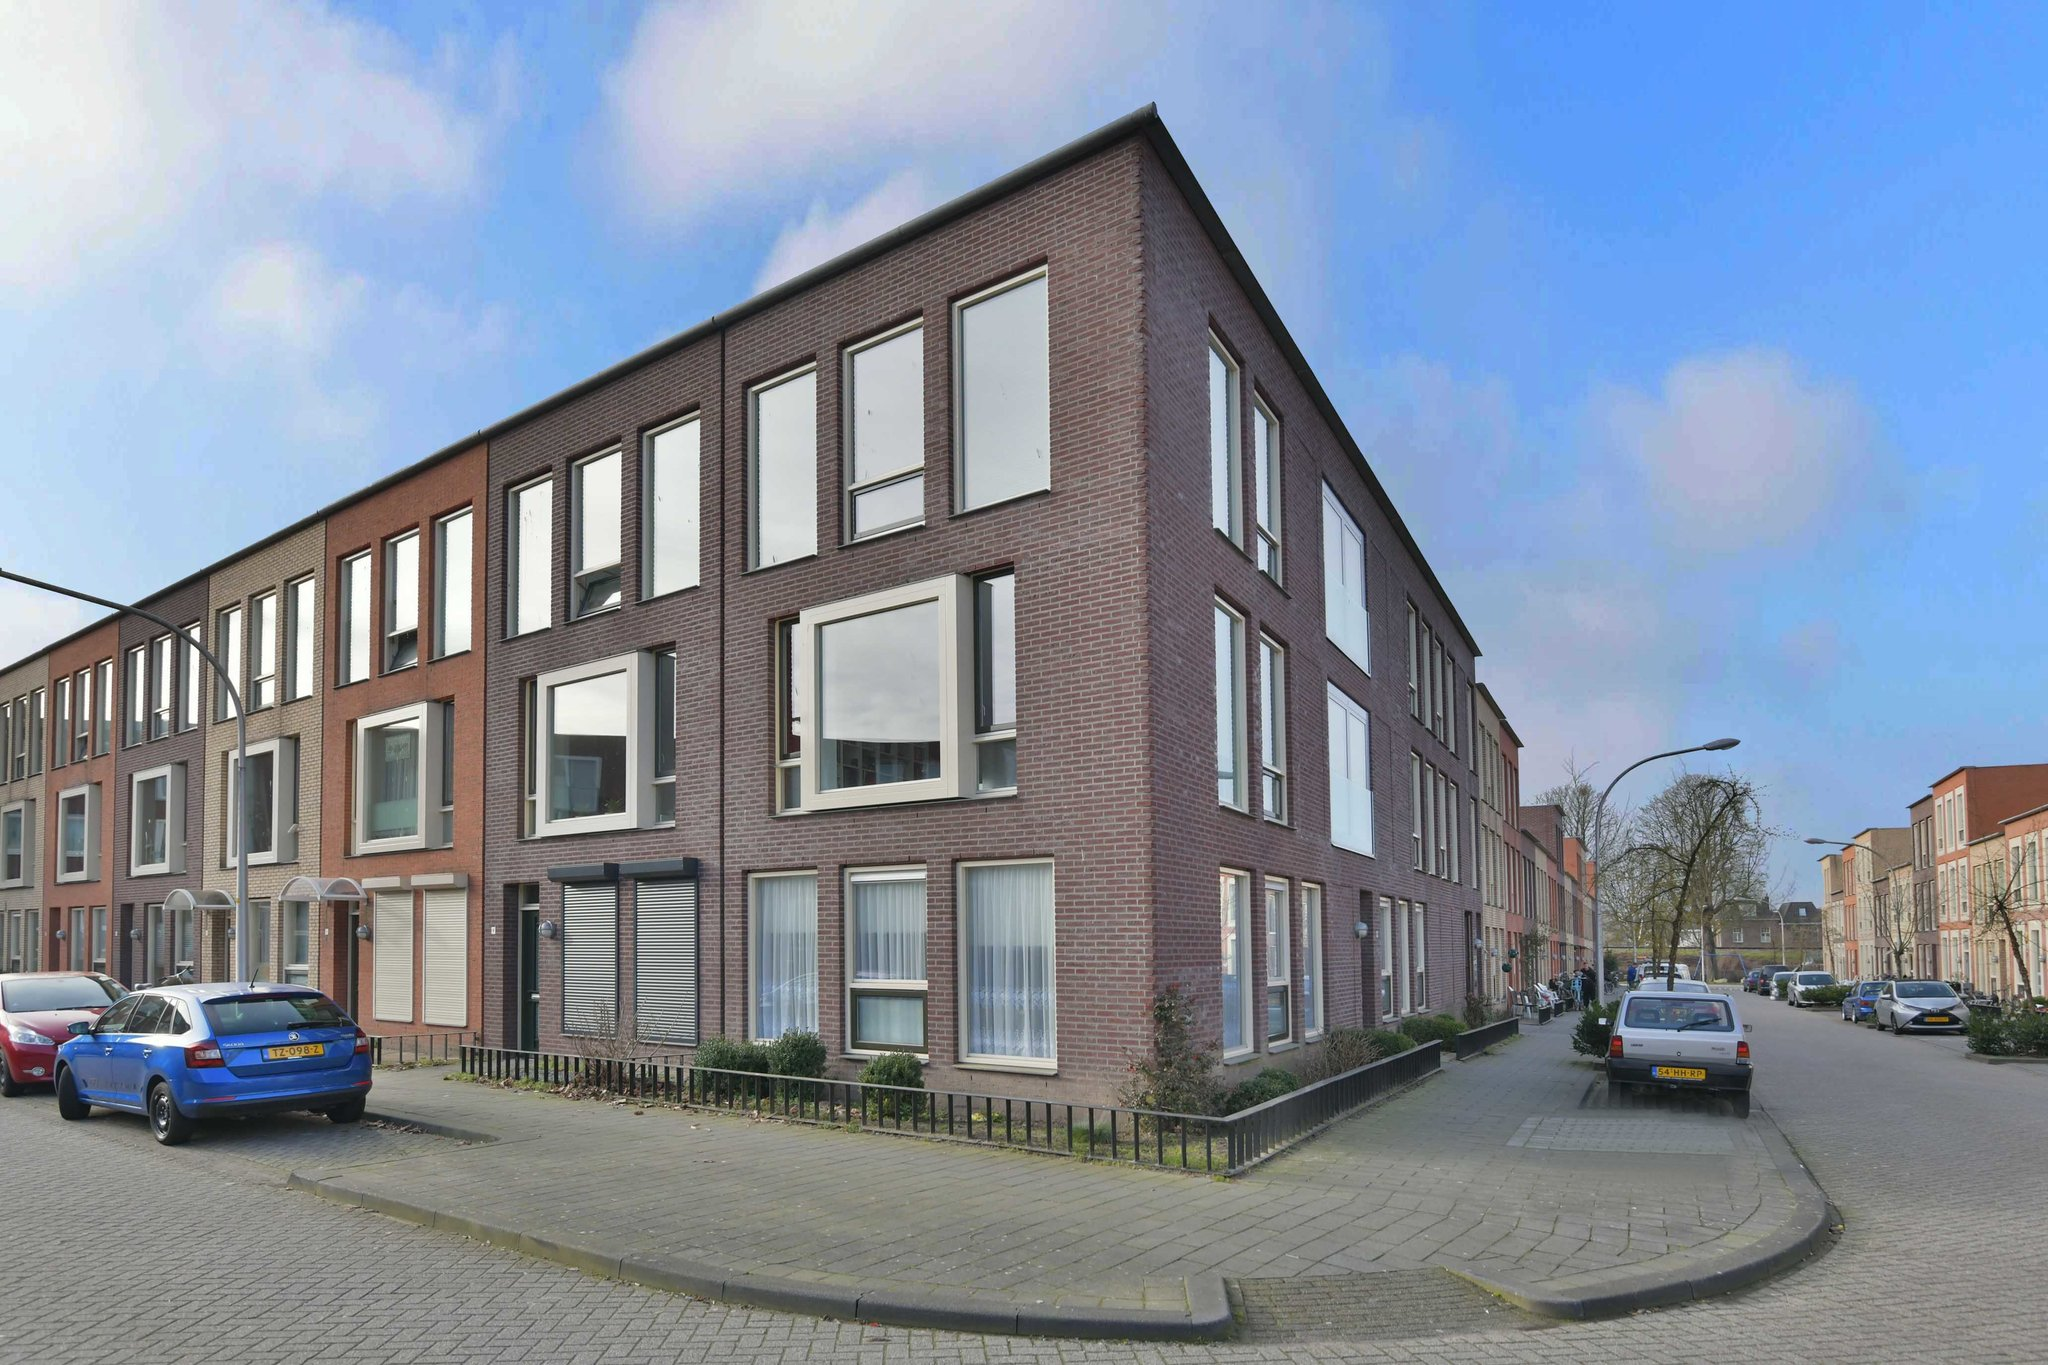 deventer-driebergenstraat-4441186-foto-1.jpg